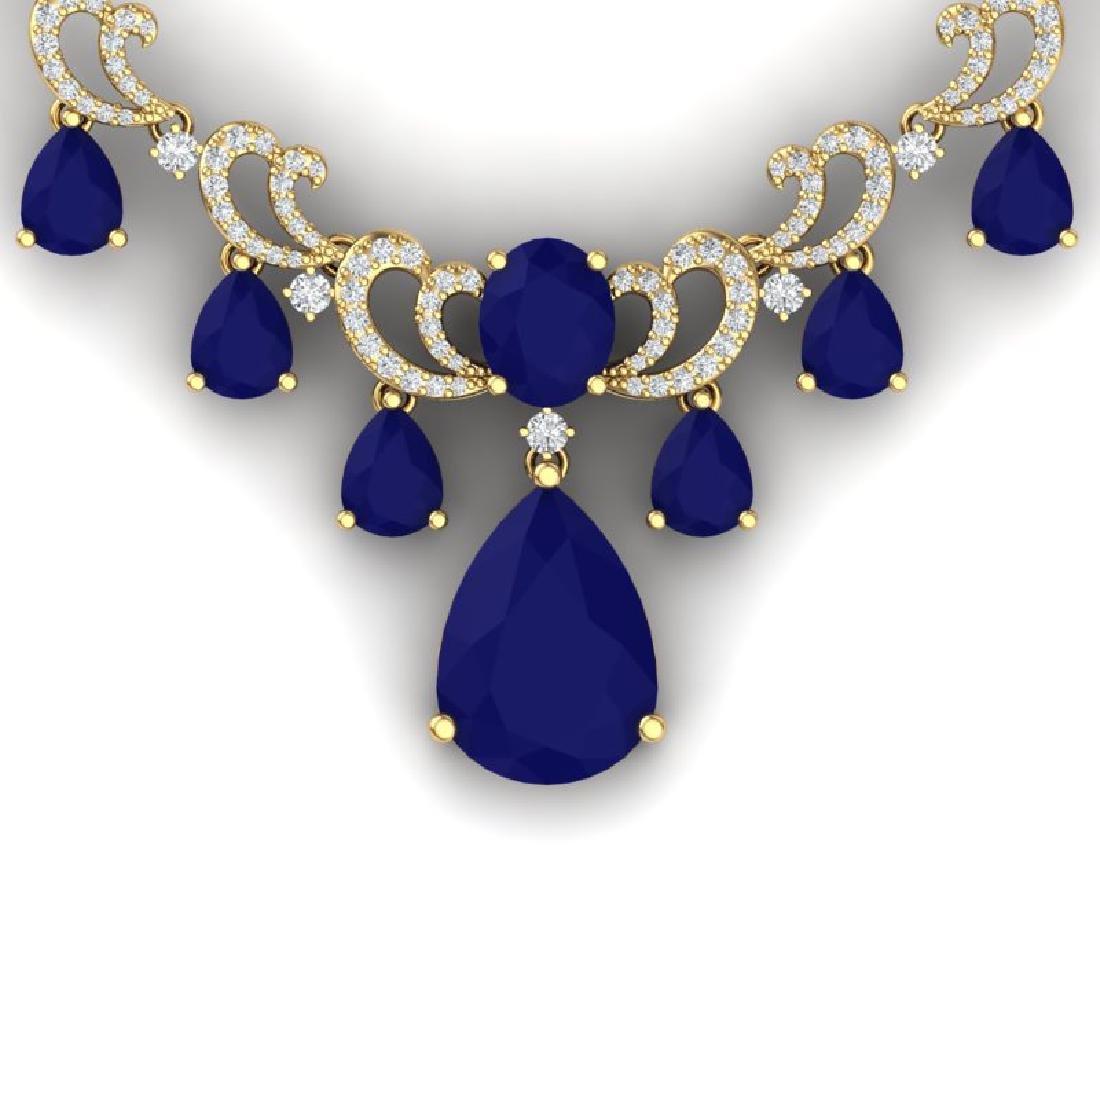 36.85 CTW Royalty Sapphire & VS Diamond Necklace 18K